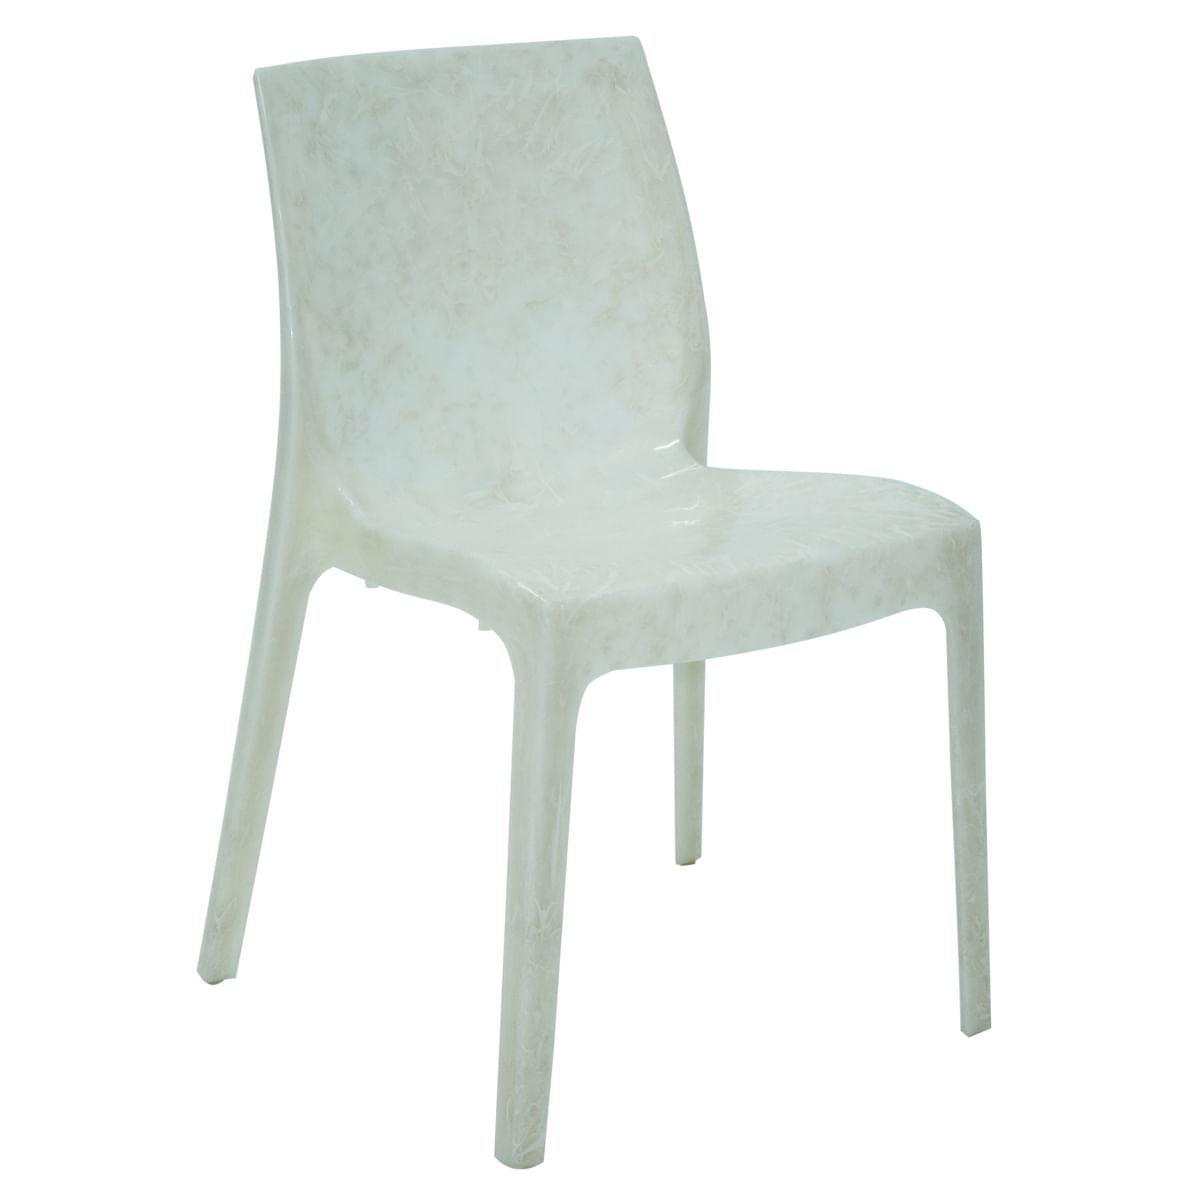 Cadeira Tramontina Alice em Polipropileno Pérola Branco